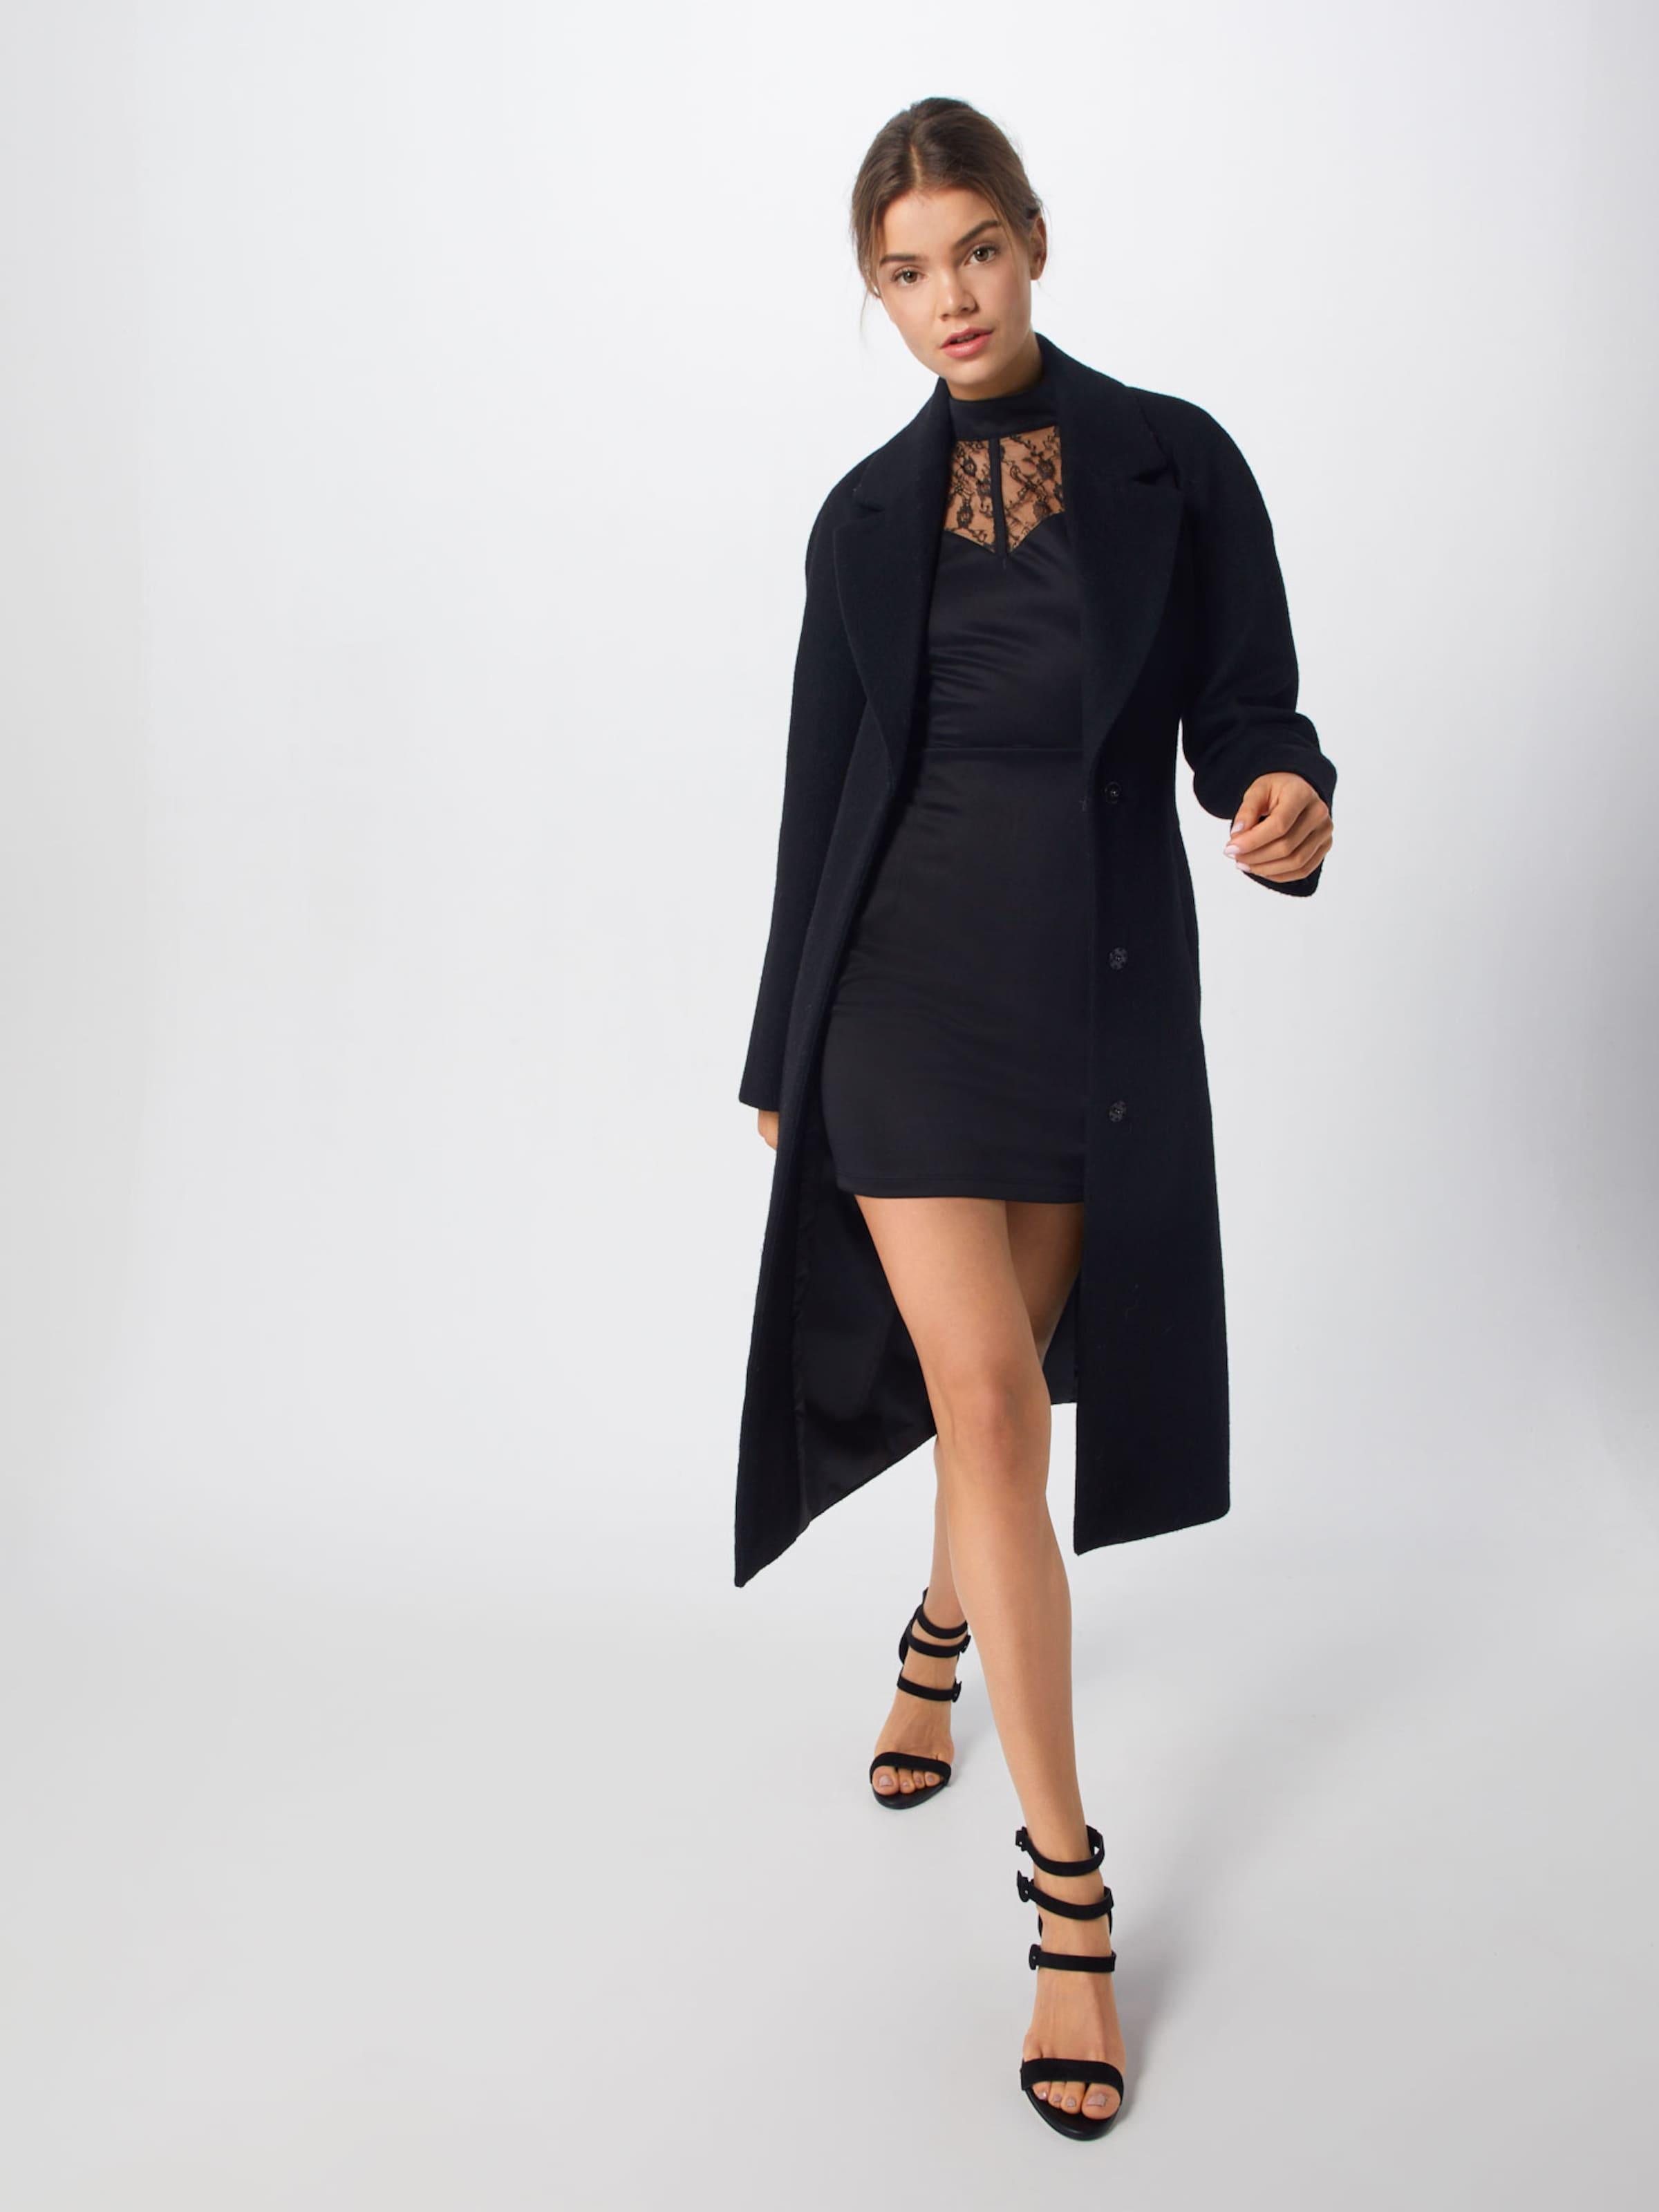 Harness Mini Missguided 'lace Sweetheart Dress' Detail Kleid Schwarz Neckline In ZkPXiuO